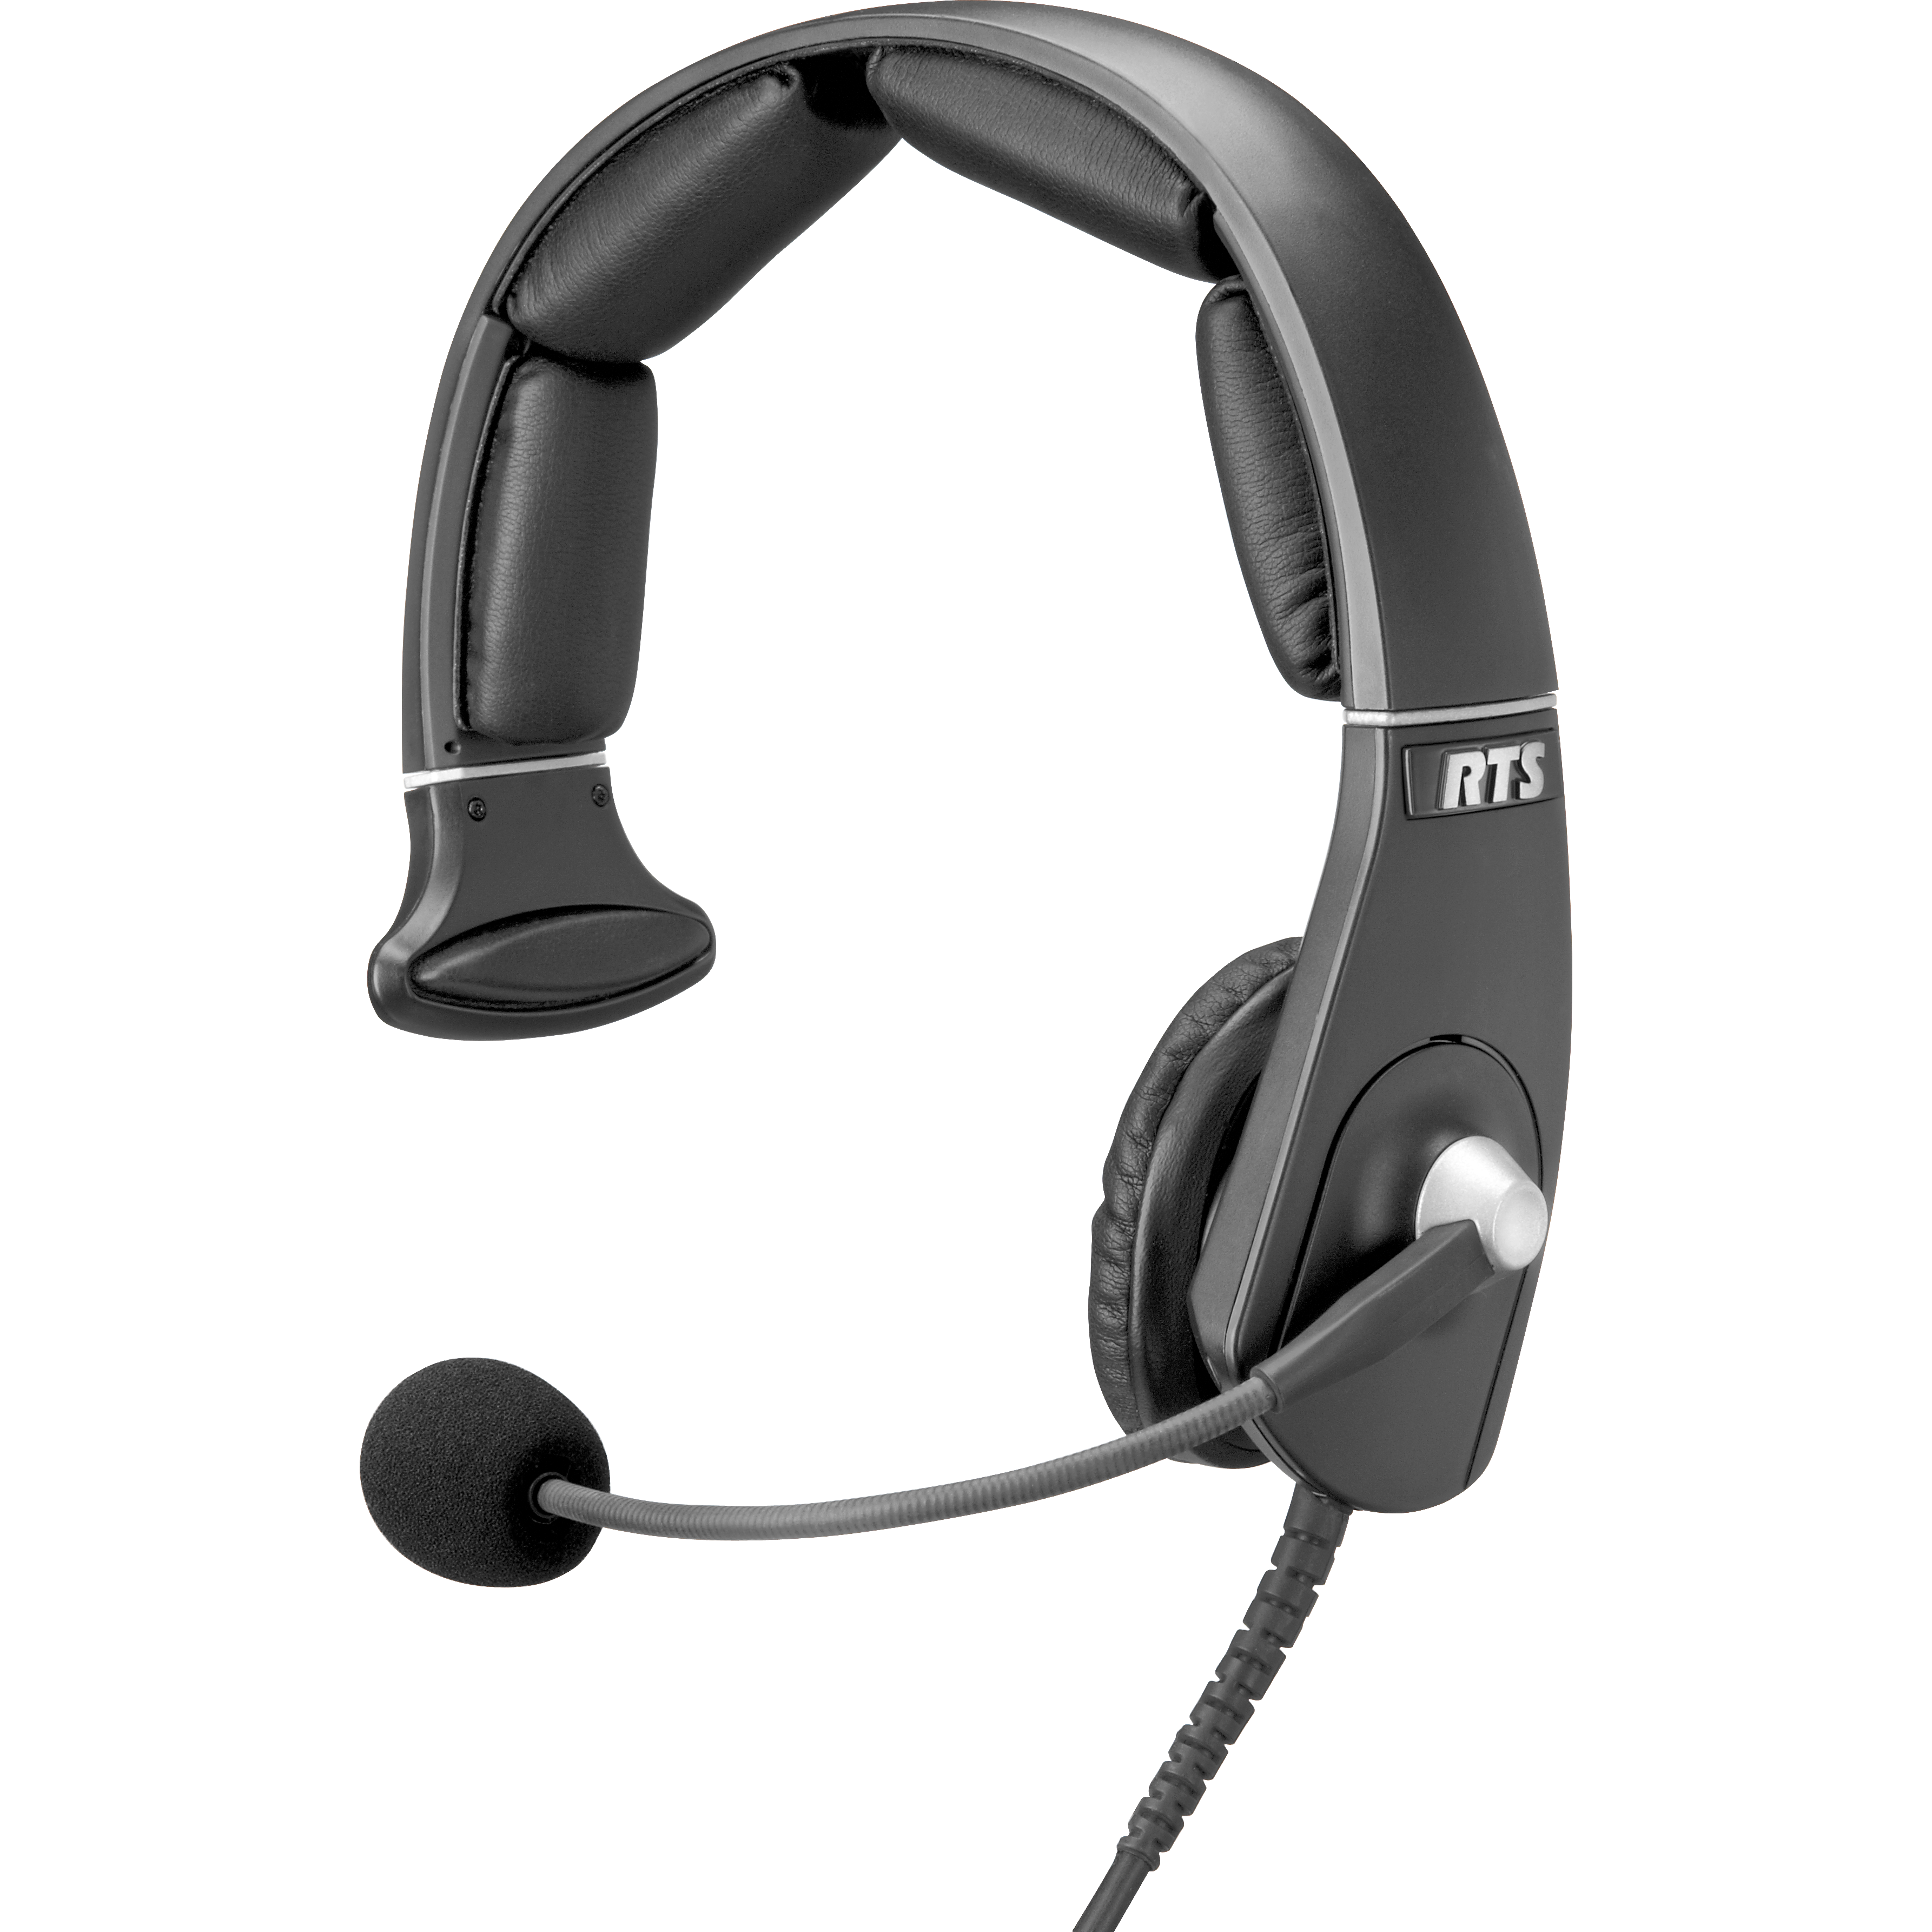 Headphones PNG images free download.